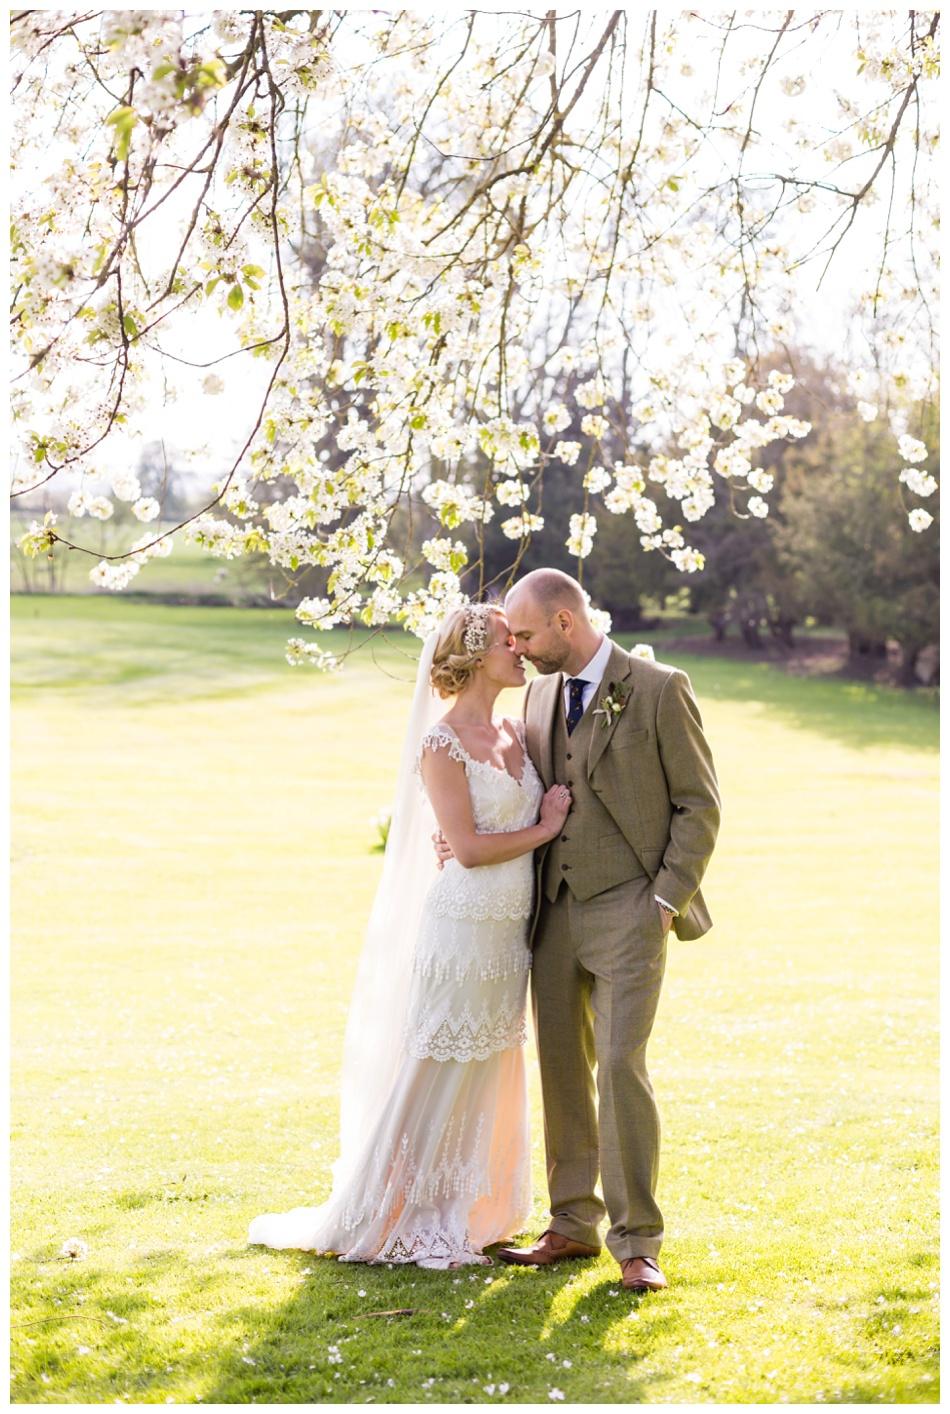 Wedding Photographer at Ettington Park